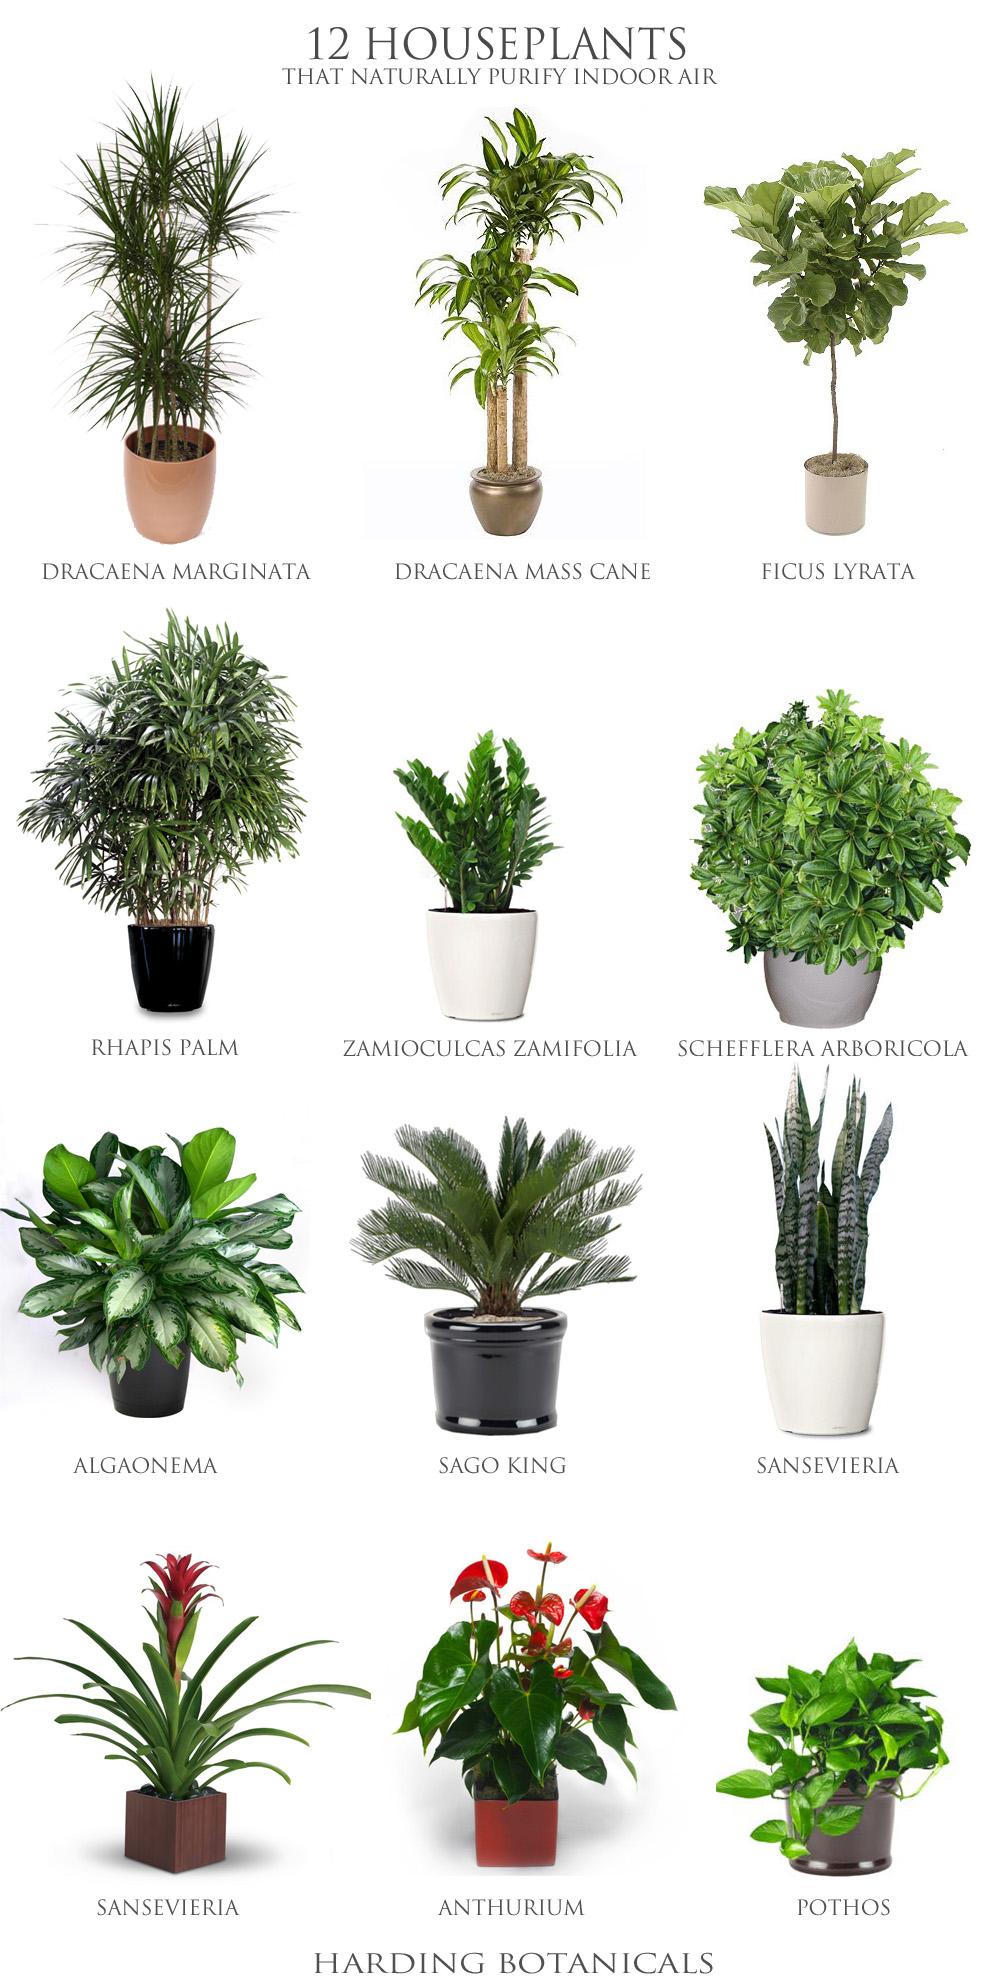 Harding Botanicals_12 house plants.jpg